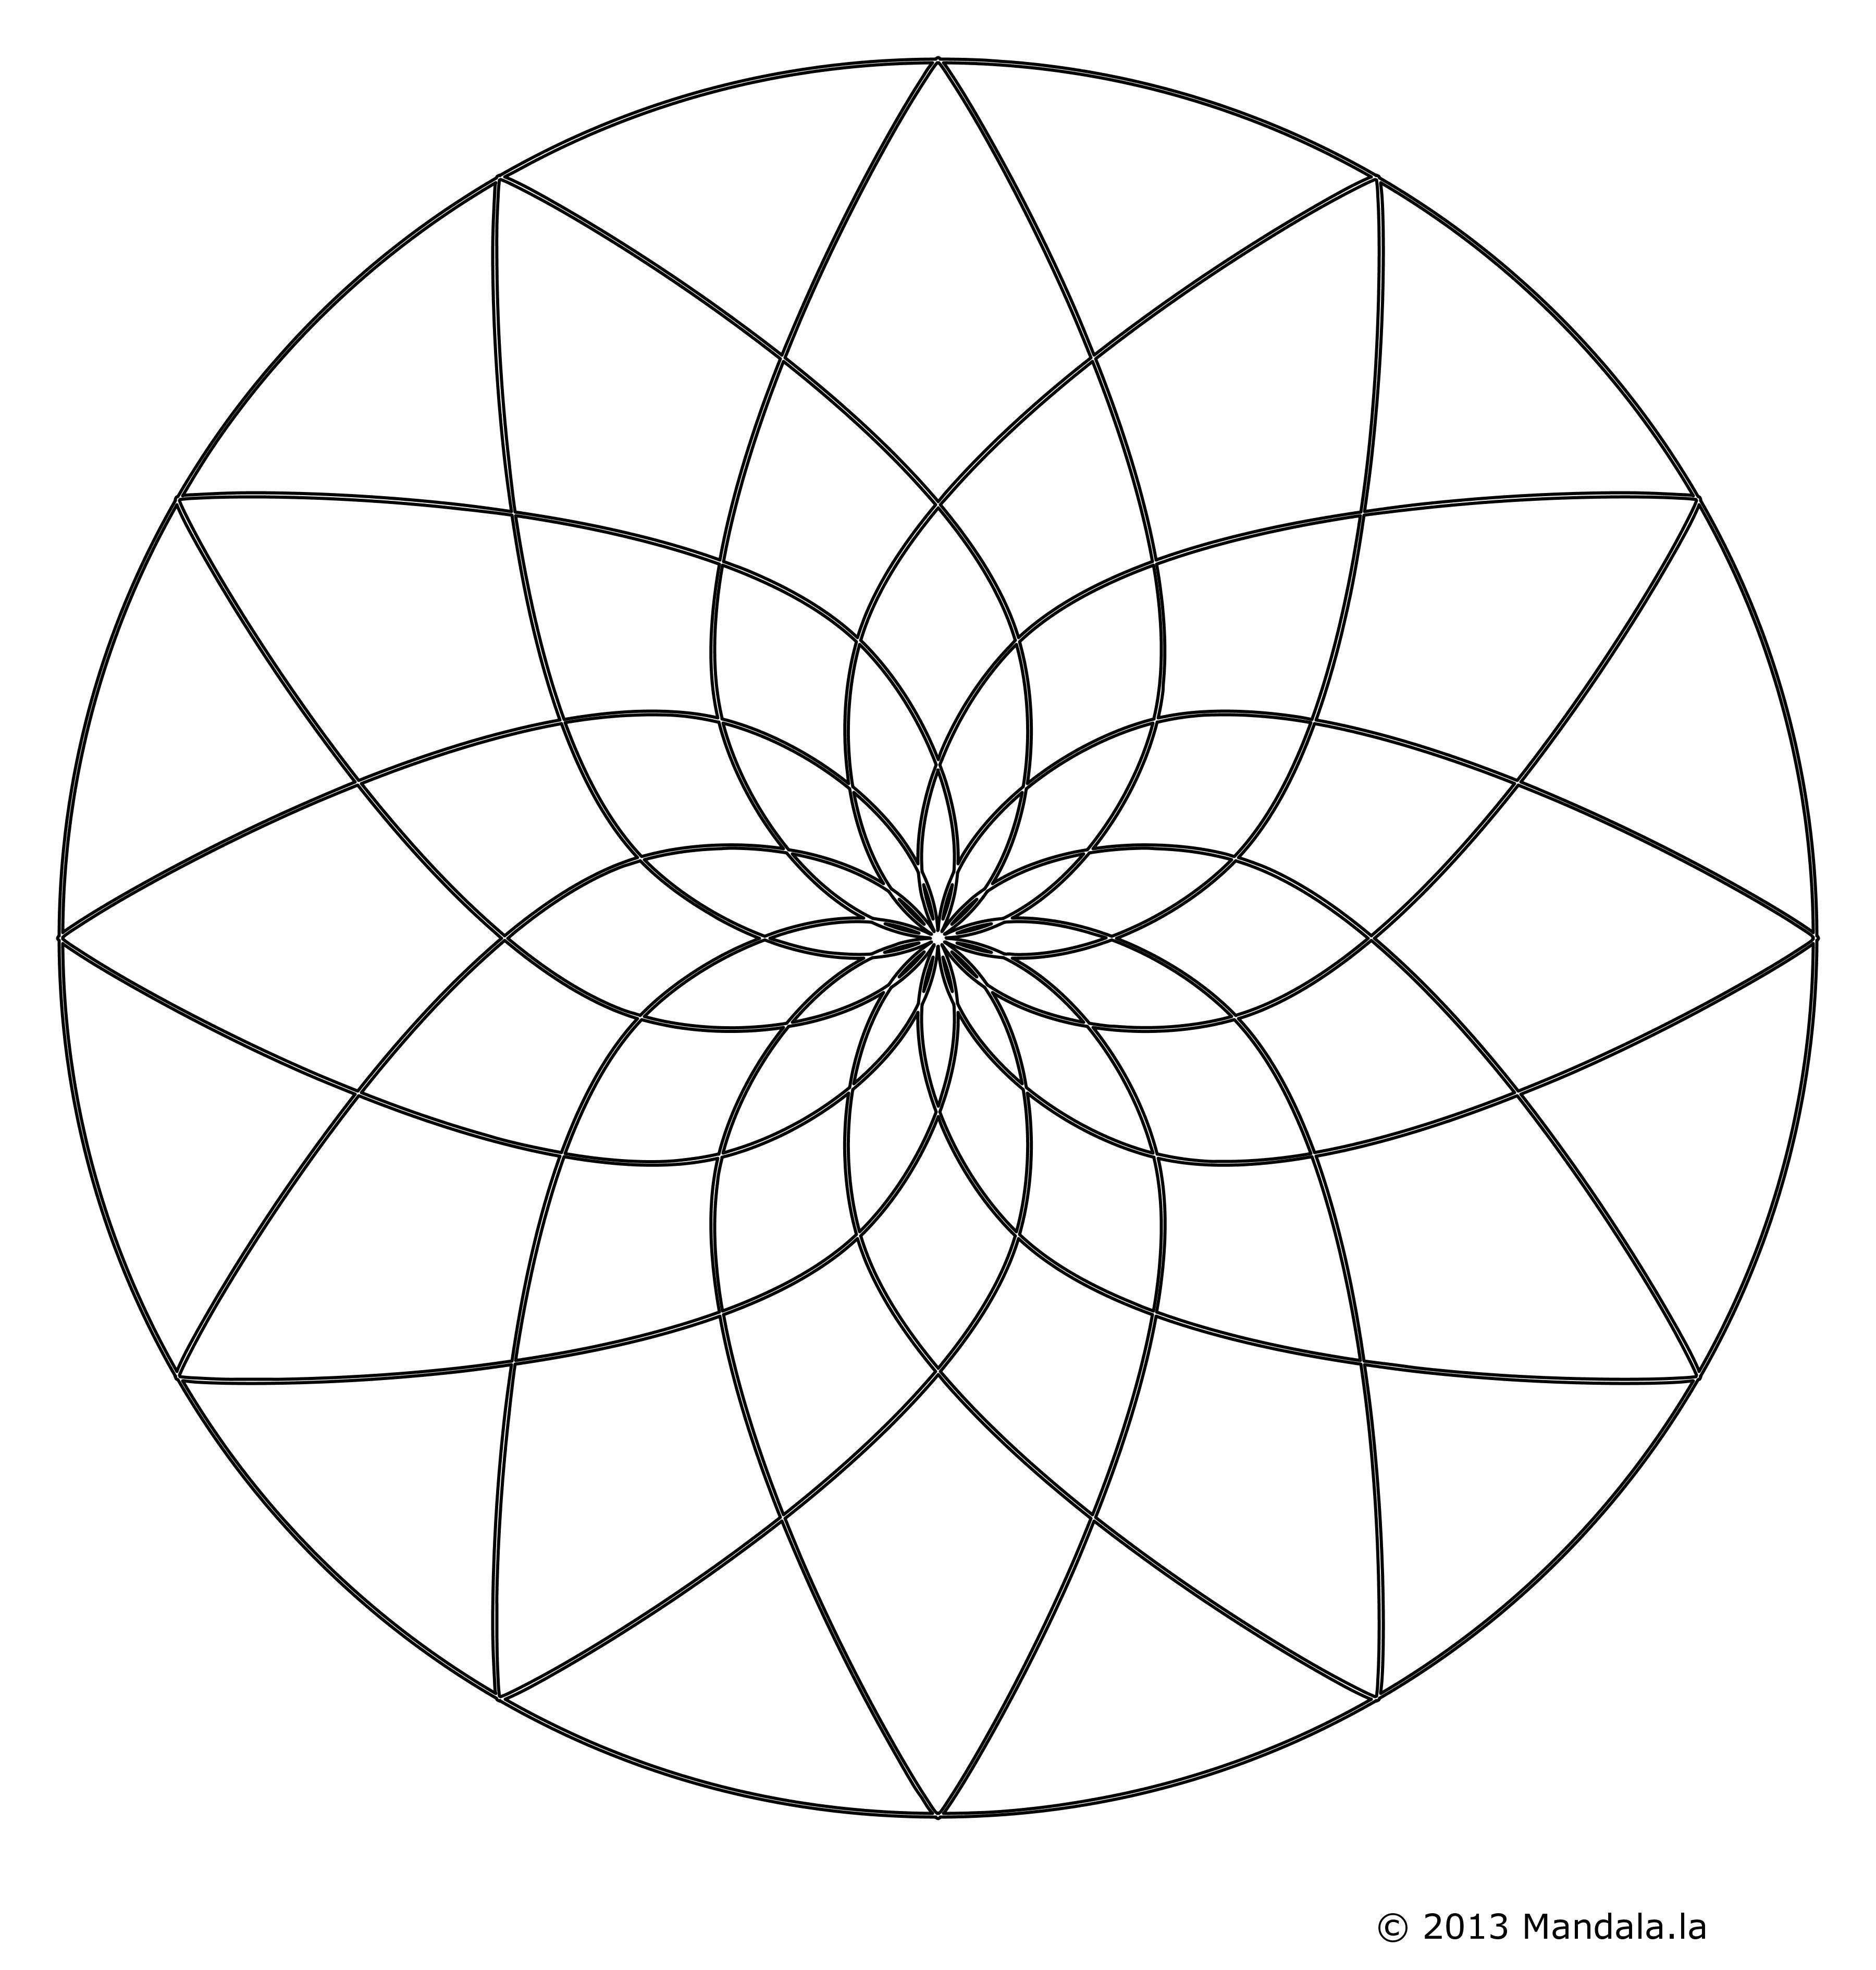 Dessin Fleur De Lotus A Imprimer